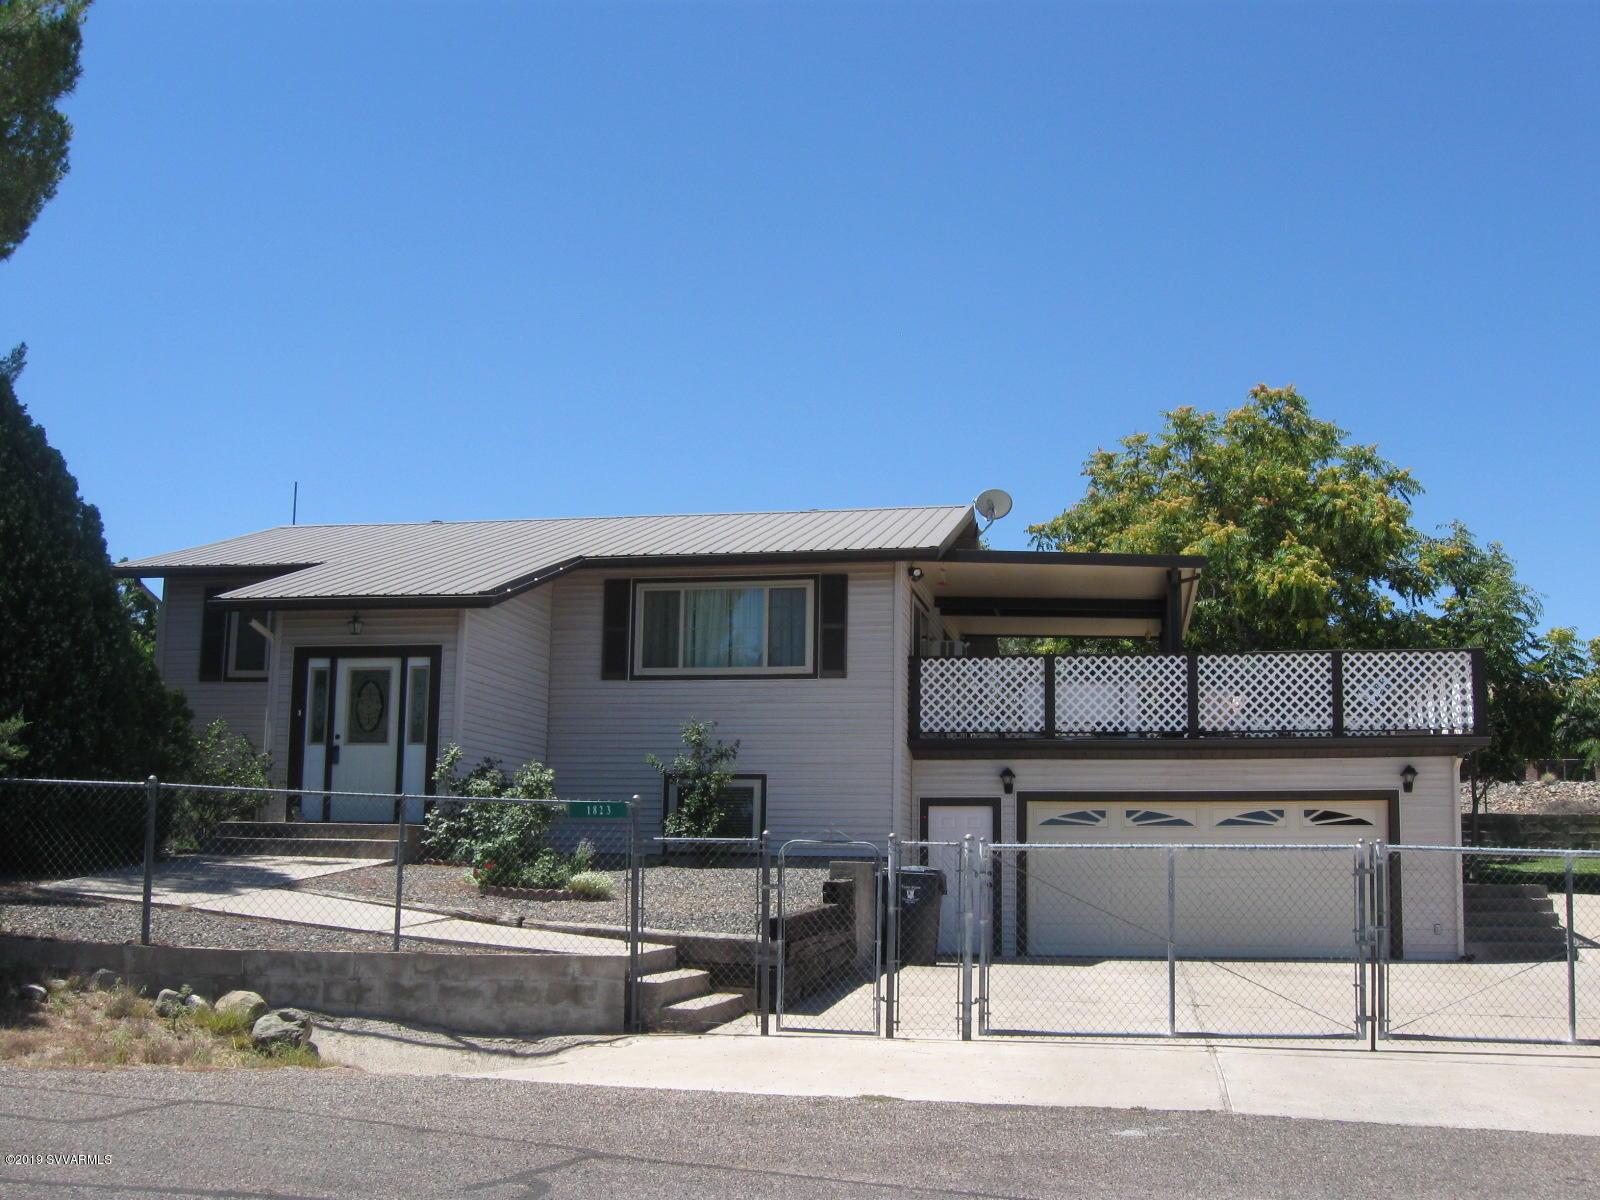 1823 S Star View Circle Cottonwood, AZ 86326